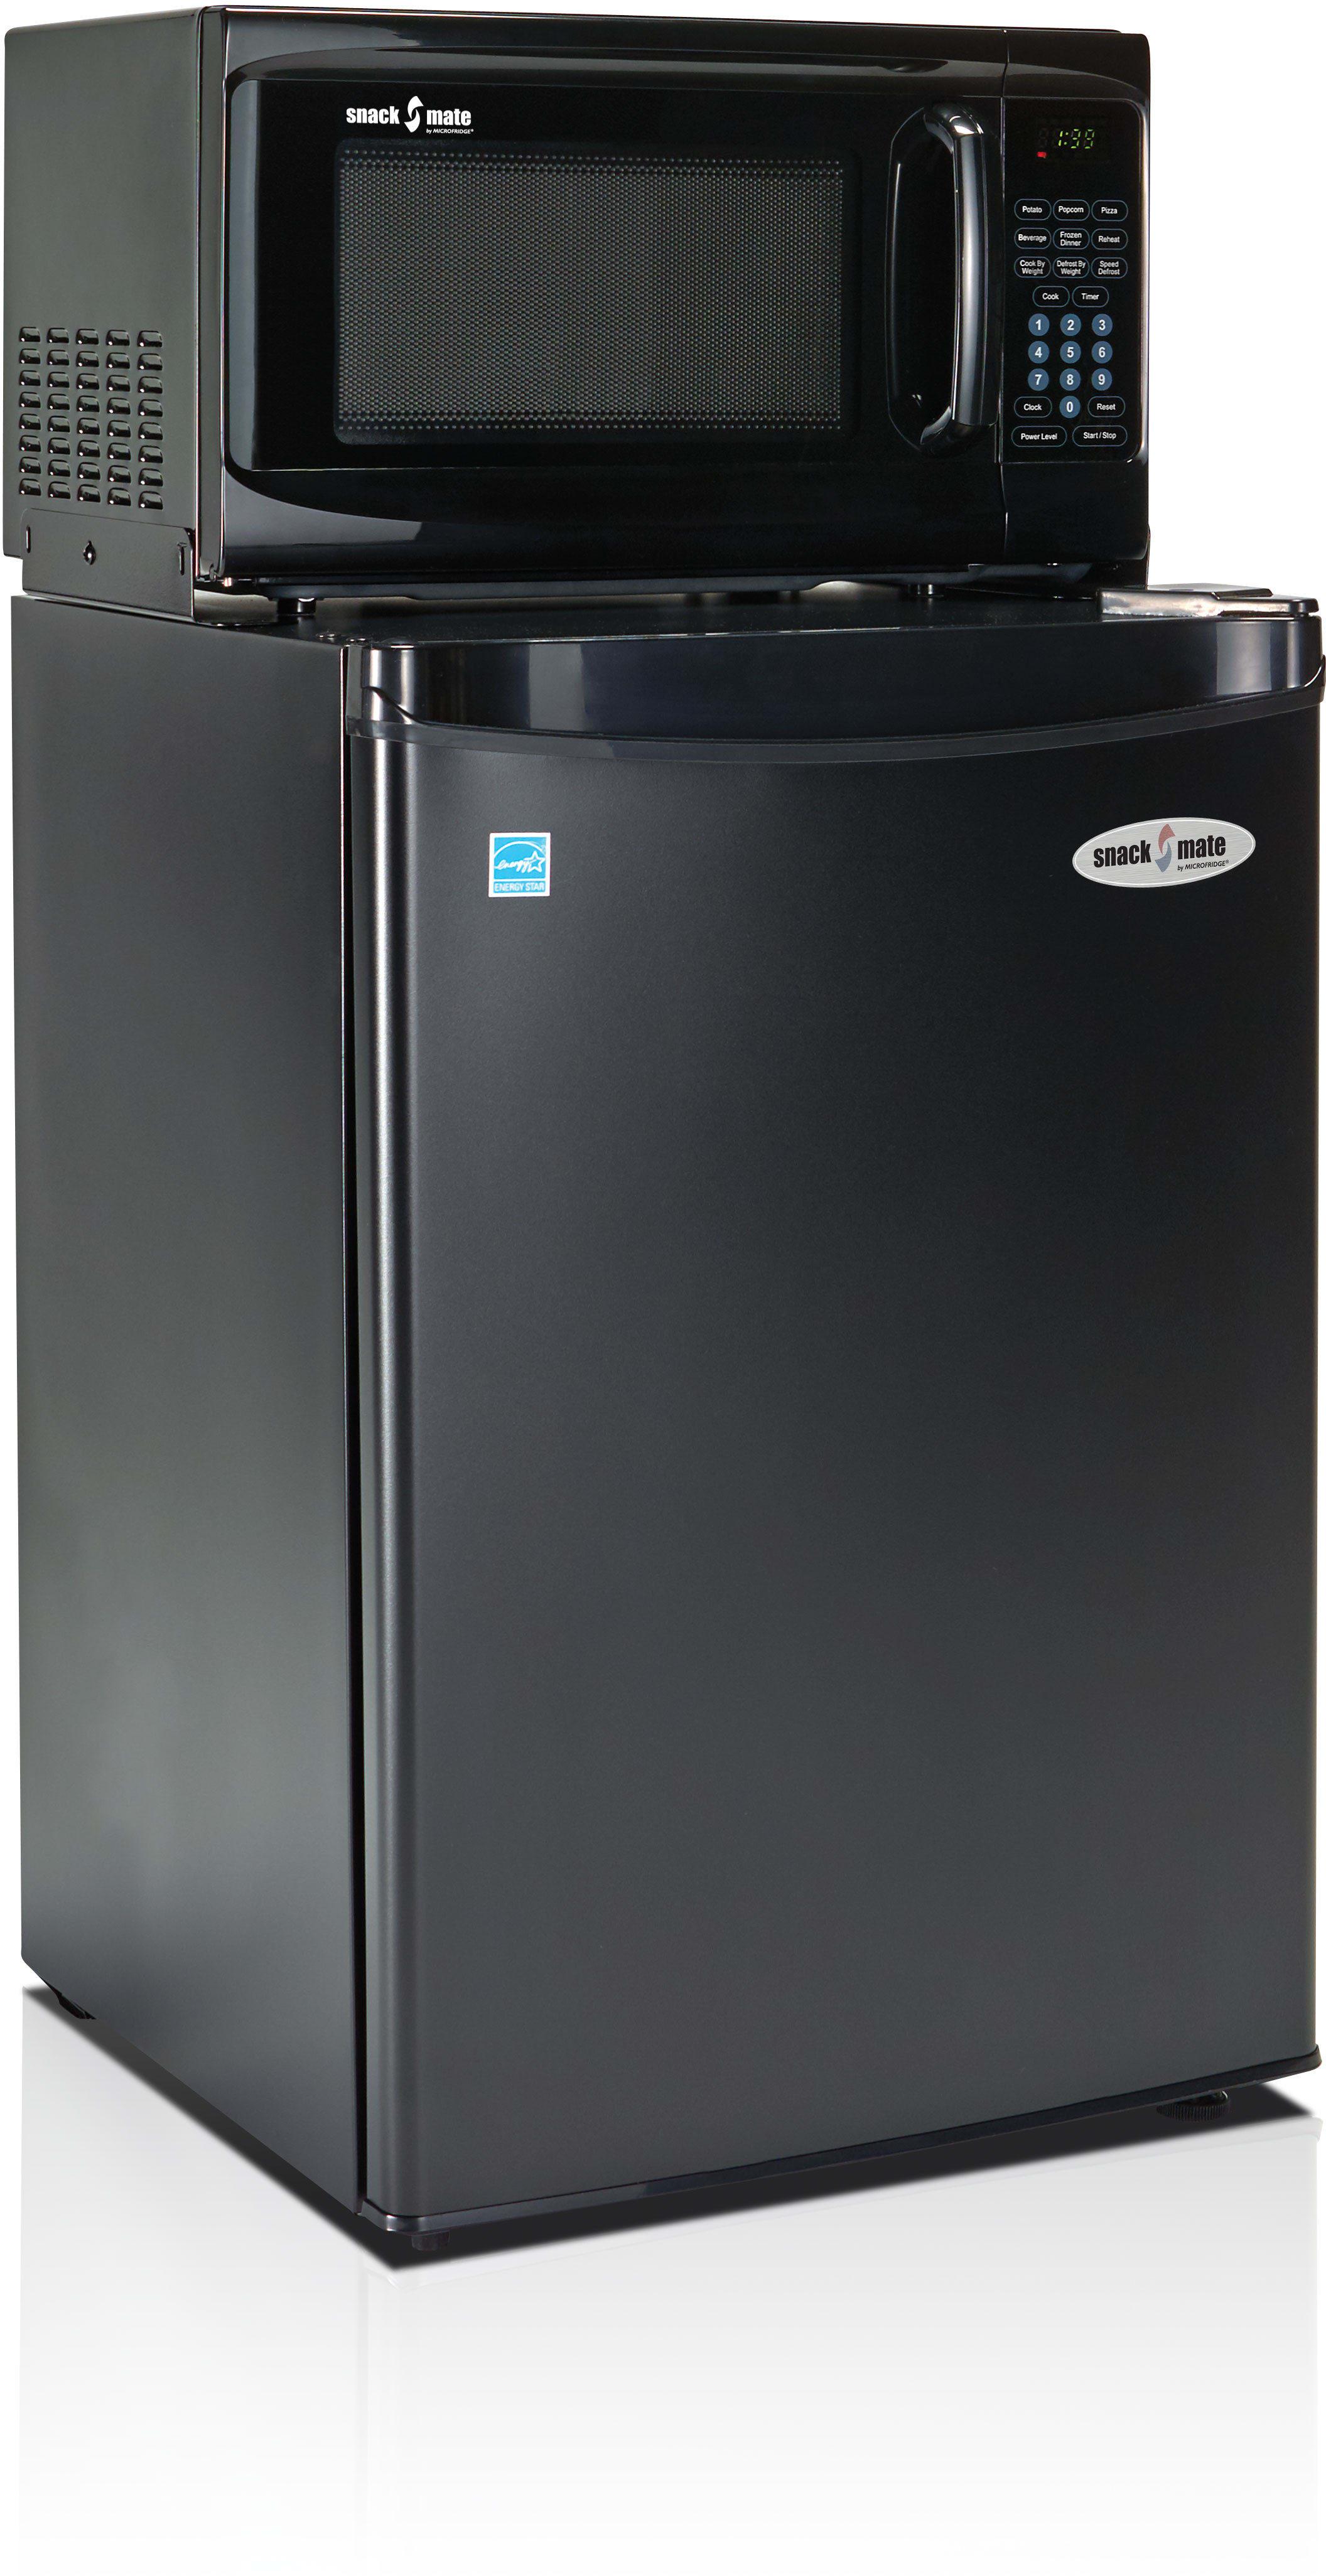 Microfridge 26sm47a1 2 6 Cu Ft Compact Refrigerator With